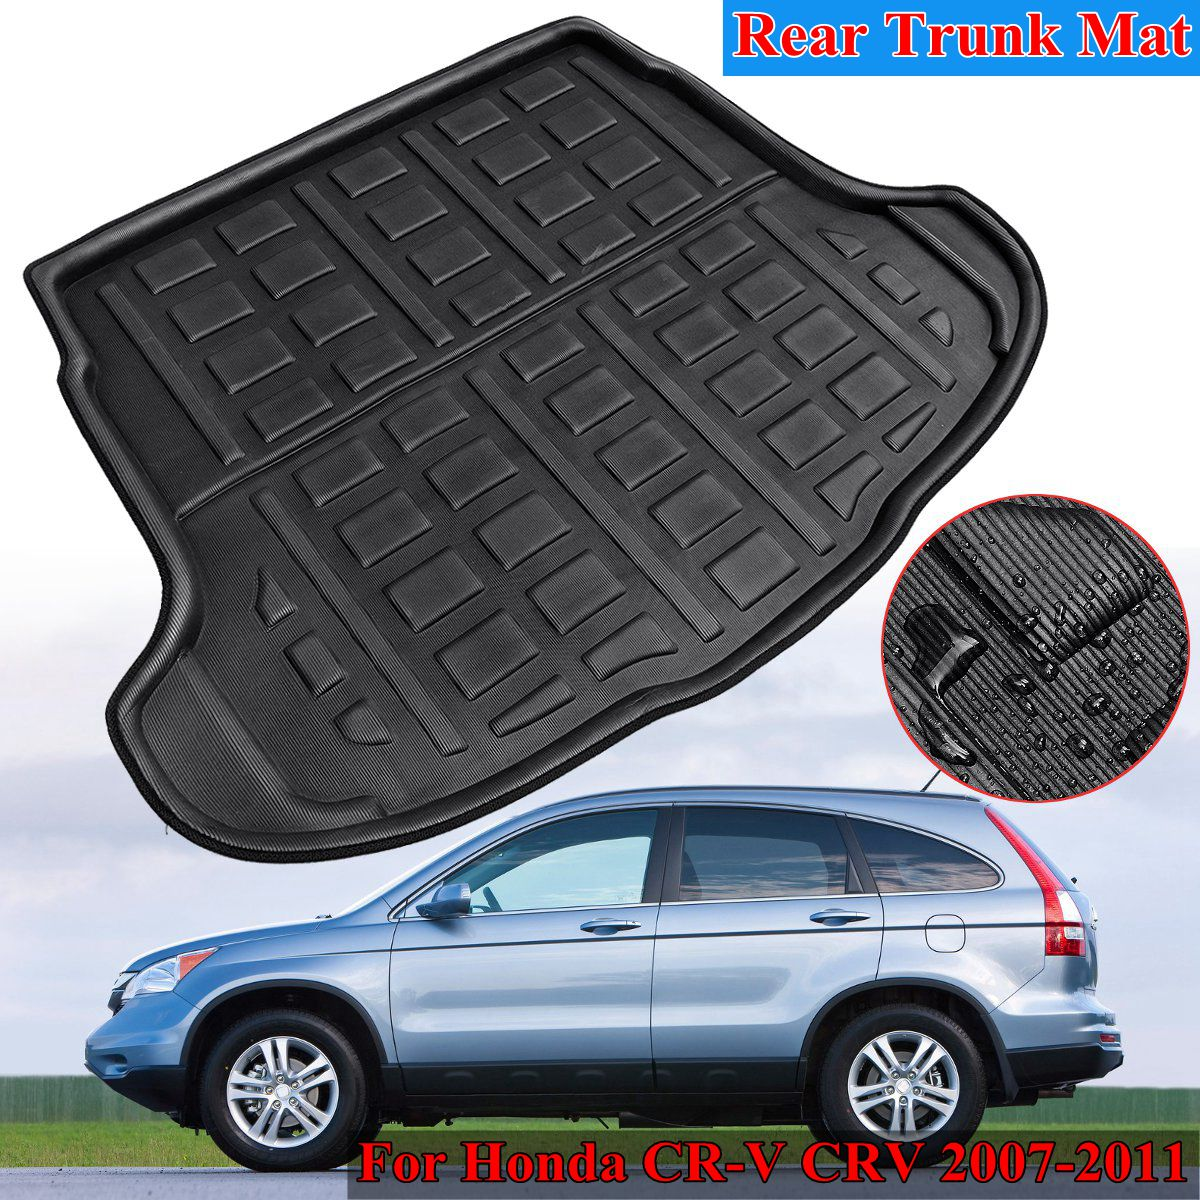 Car Rear Cargo Boot Trunk Mat Tray Pad Protector for Honda CR-V CRV 2012-2016